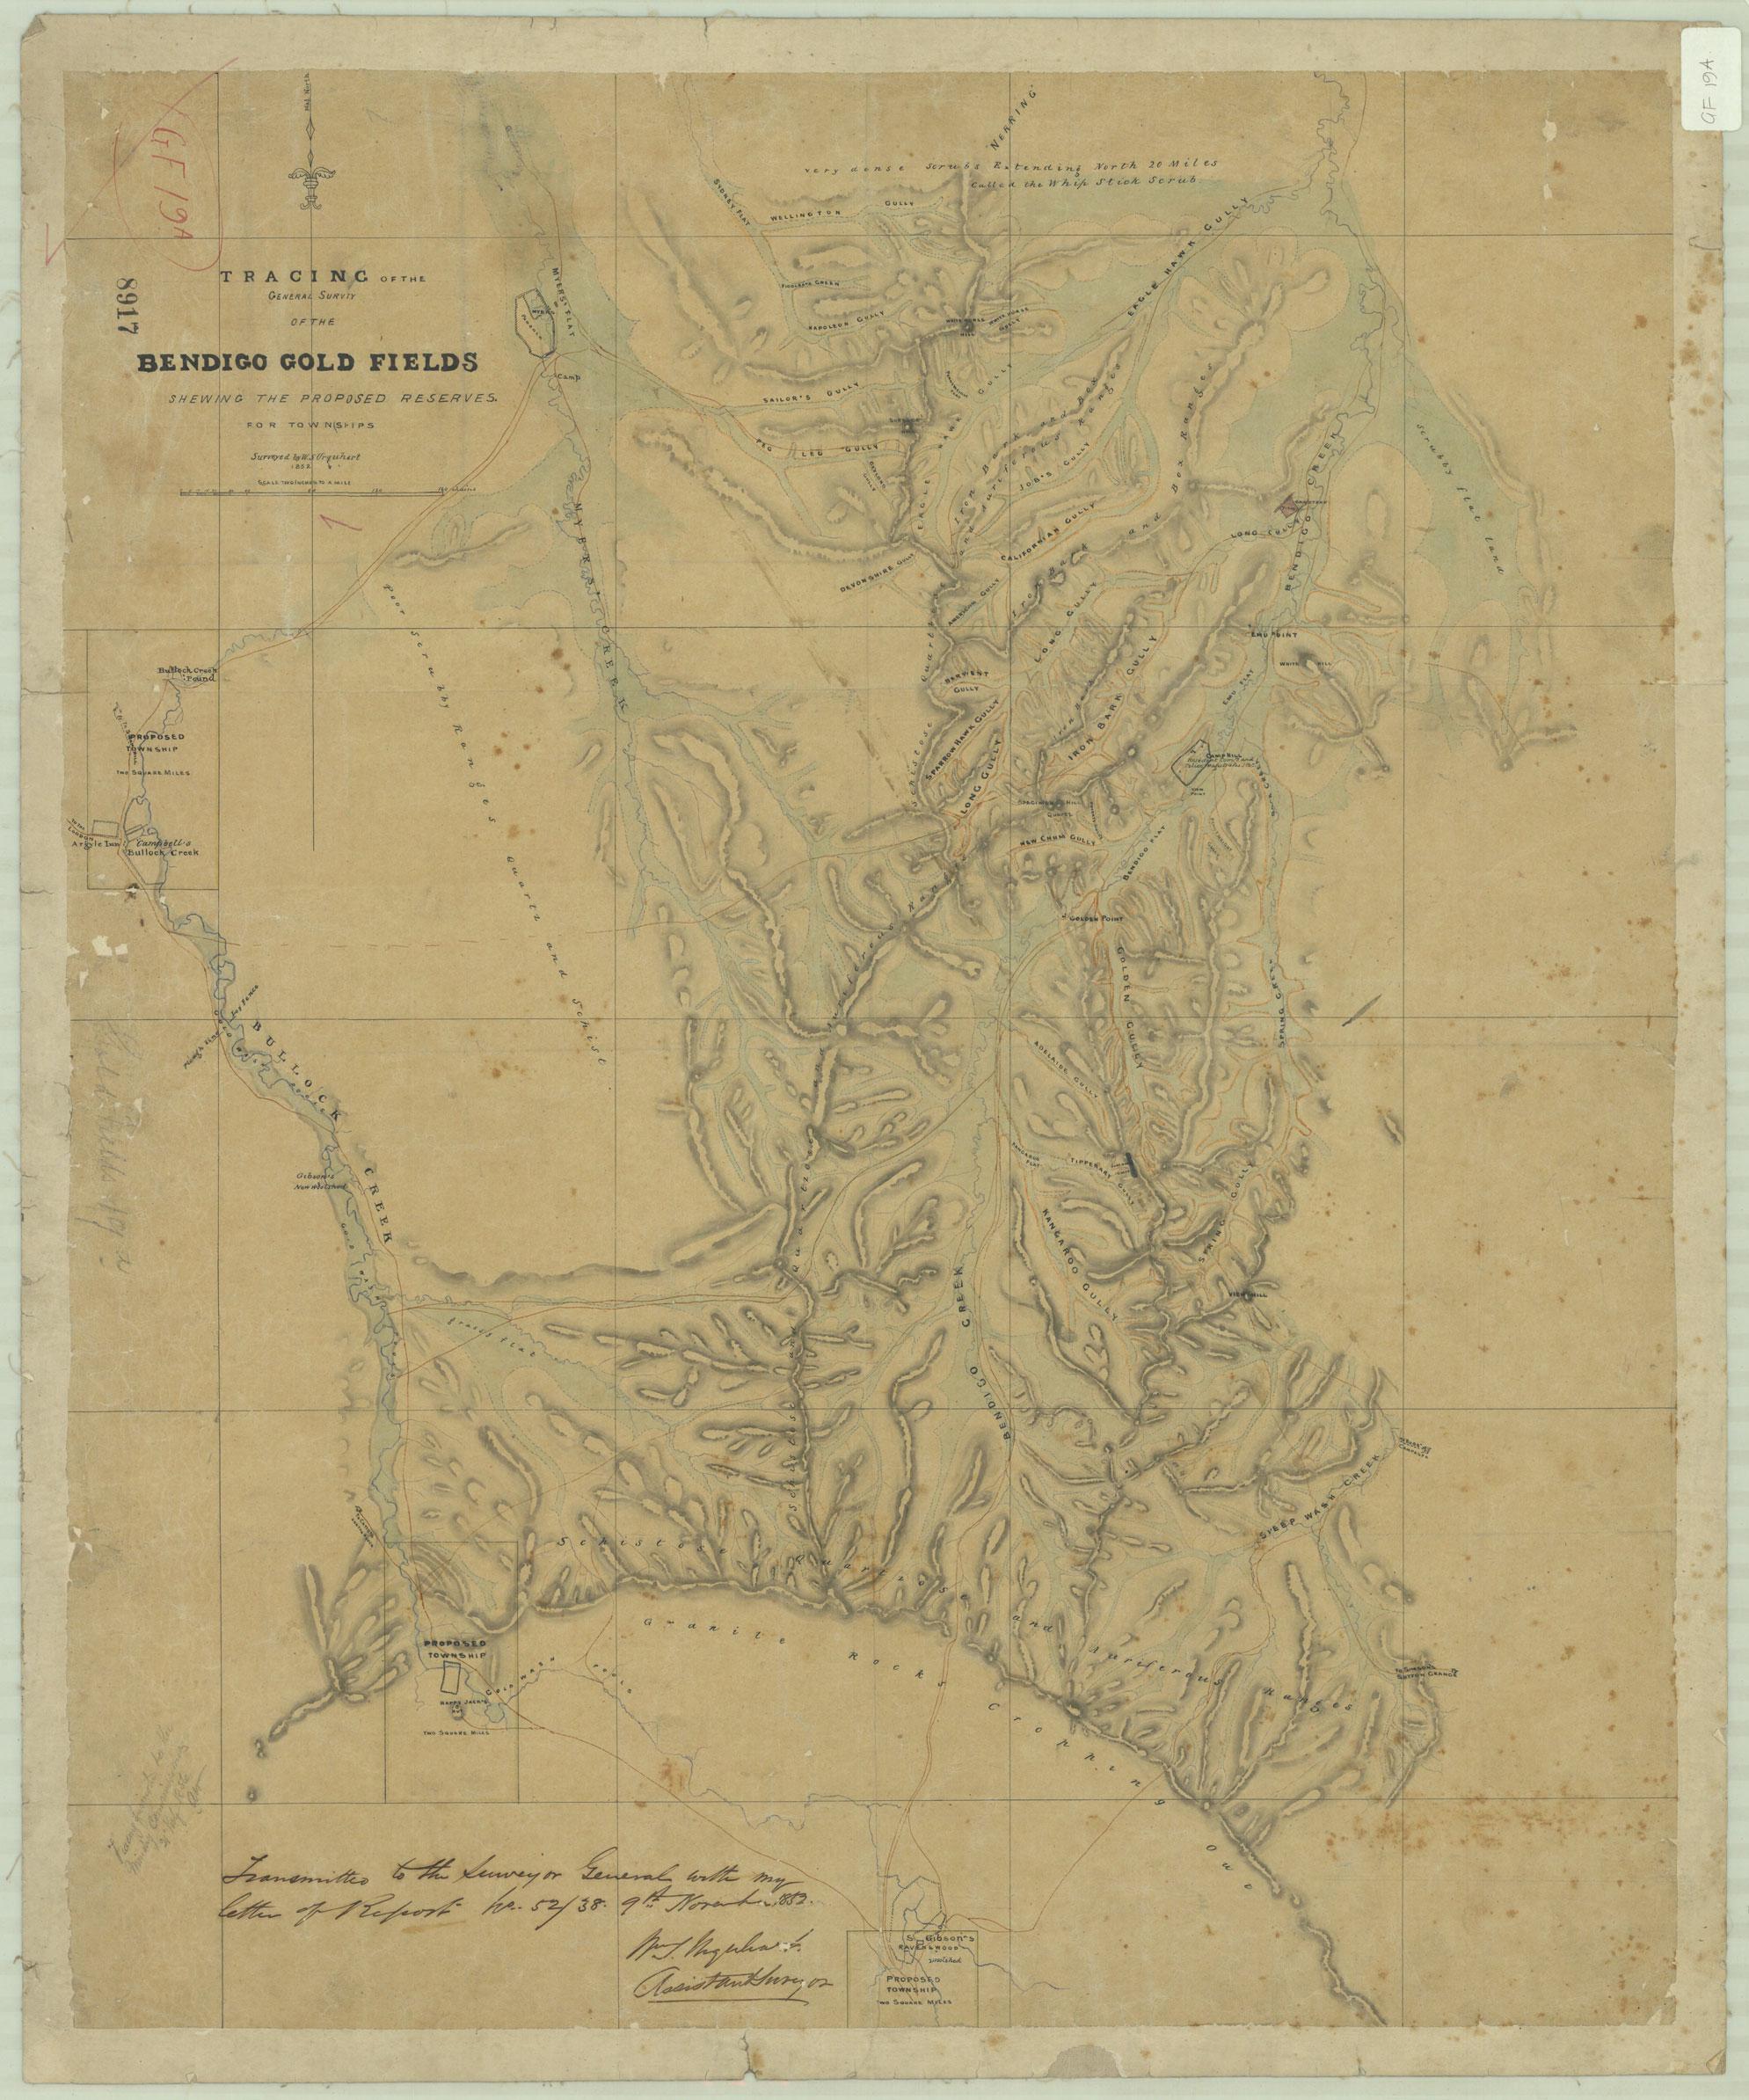 GF19A-BENDIGO-GOLDFIELDS-1852-public-records-office-victoria.jpg